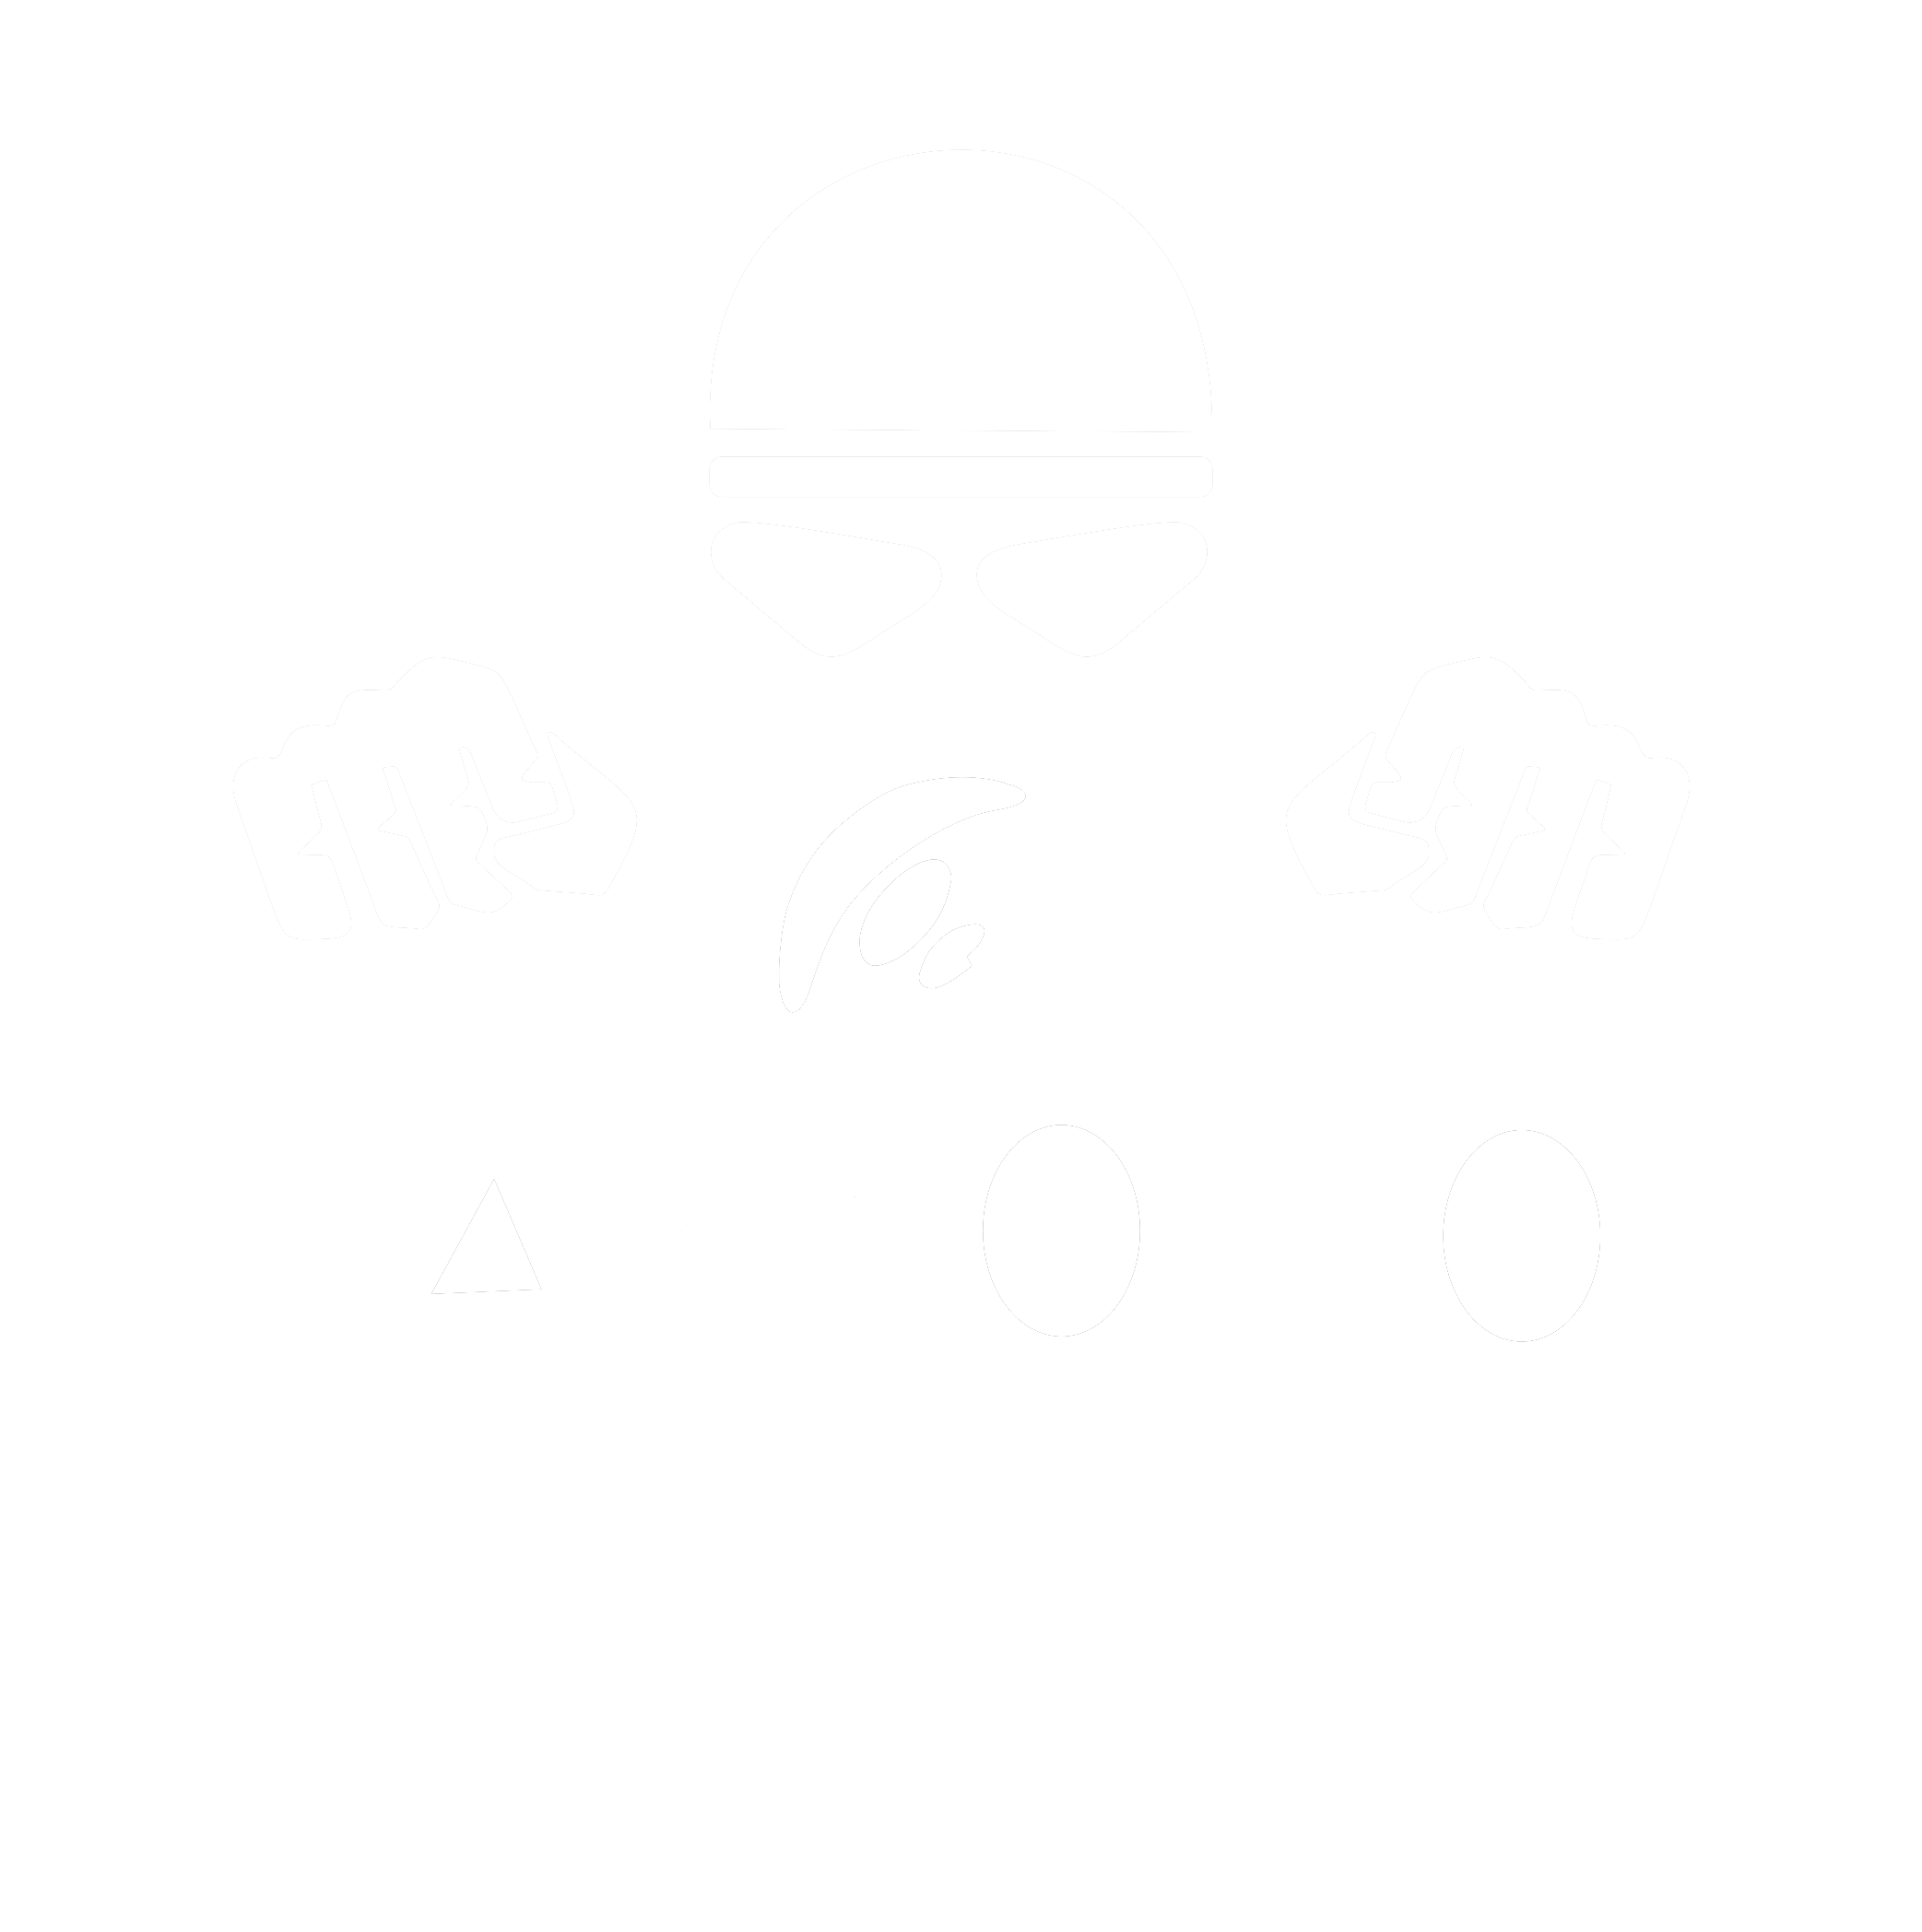 iamoto Garage